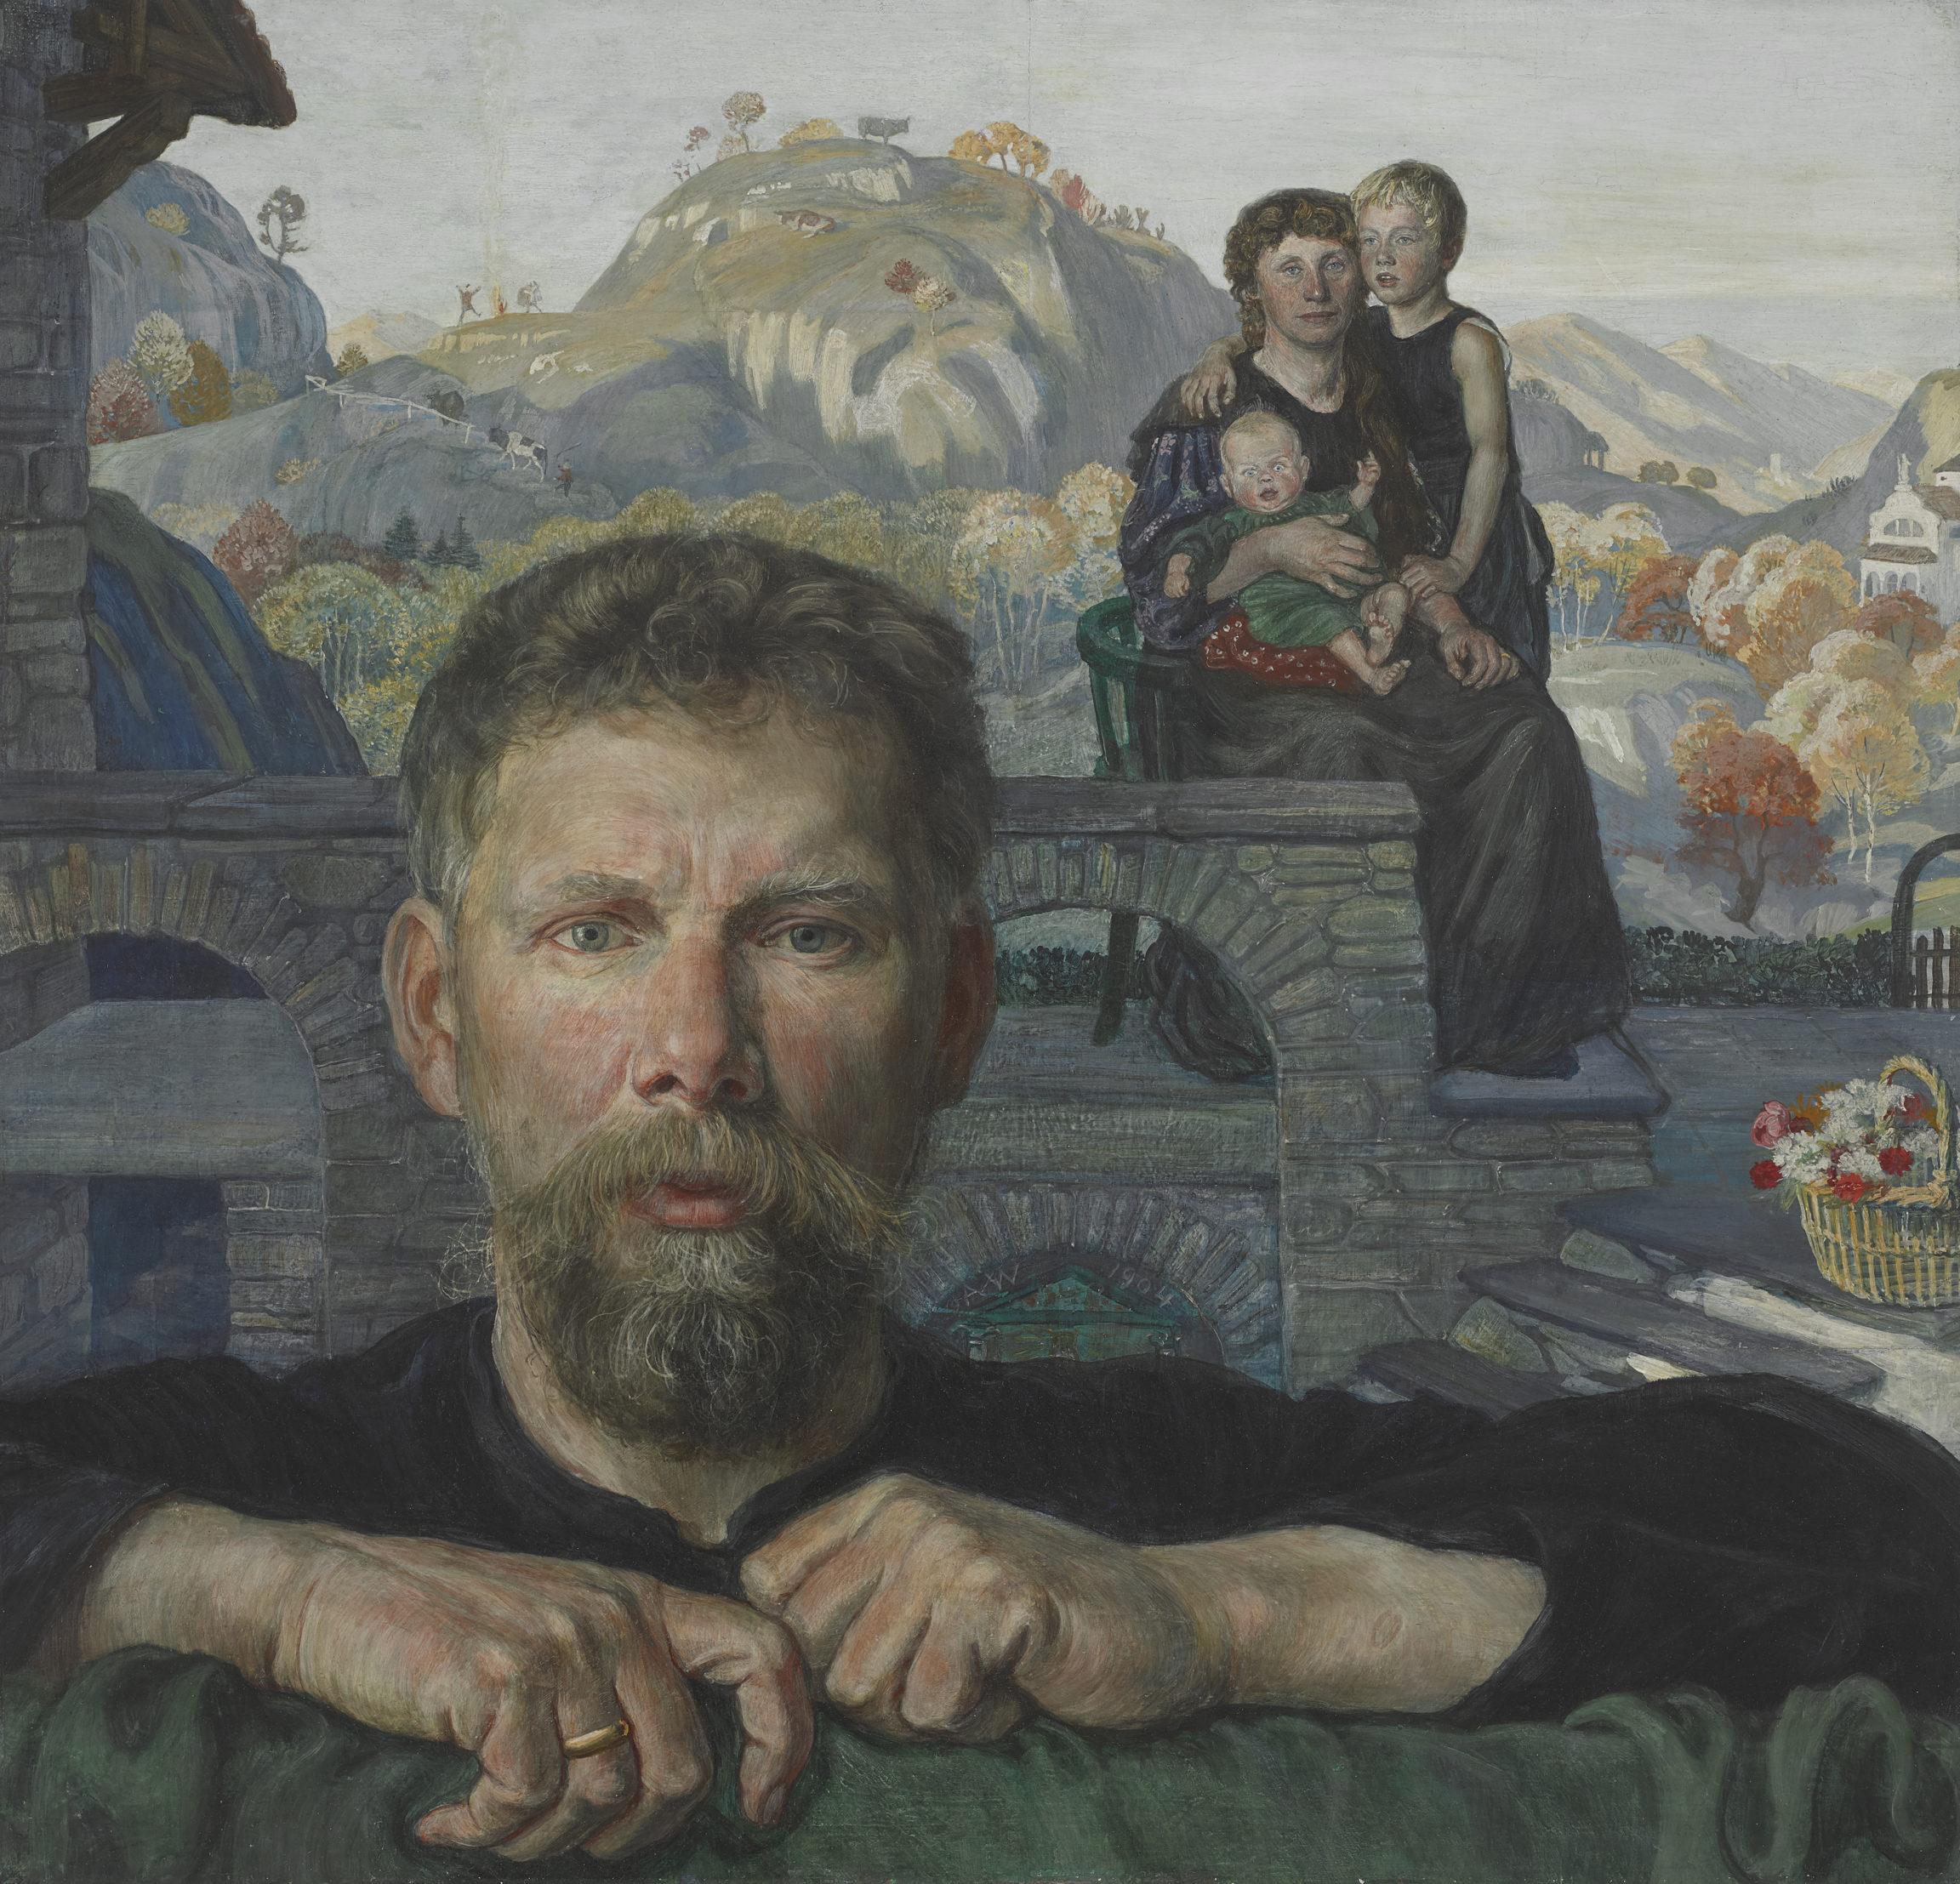 Albert Welti, Portrait de famille (Family Portrait), 1904